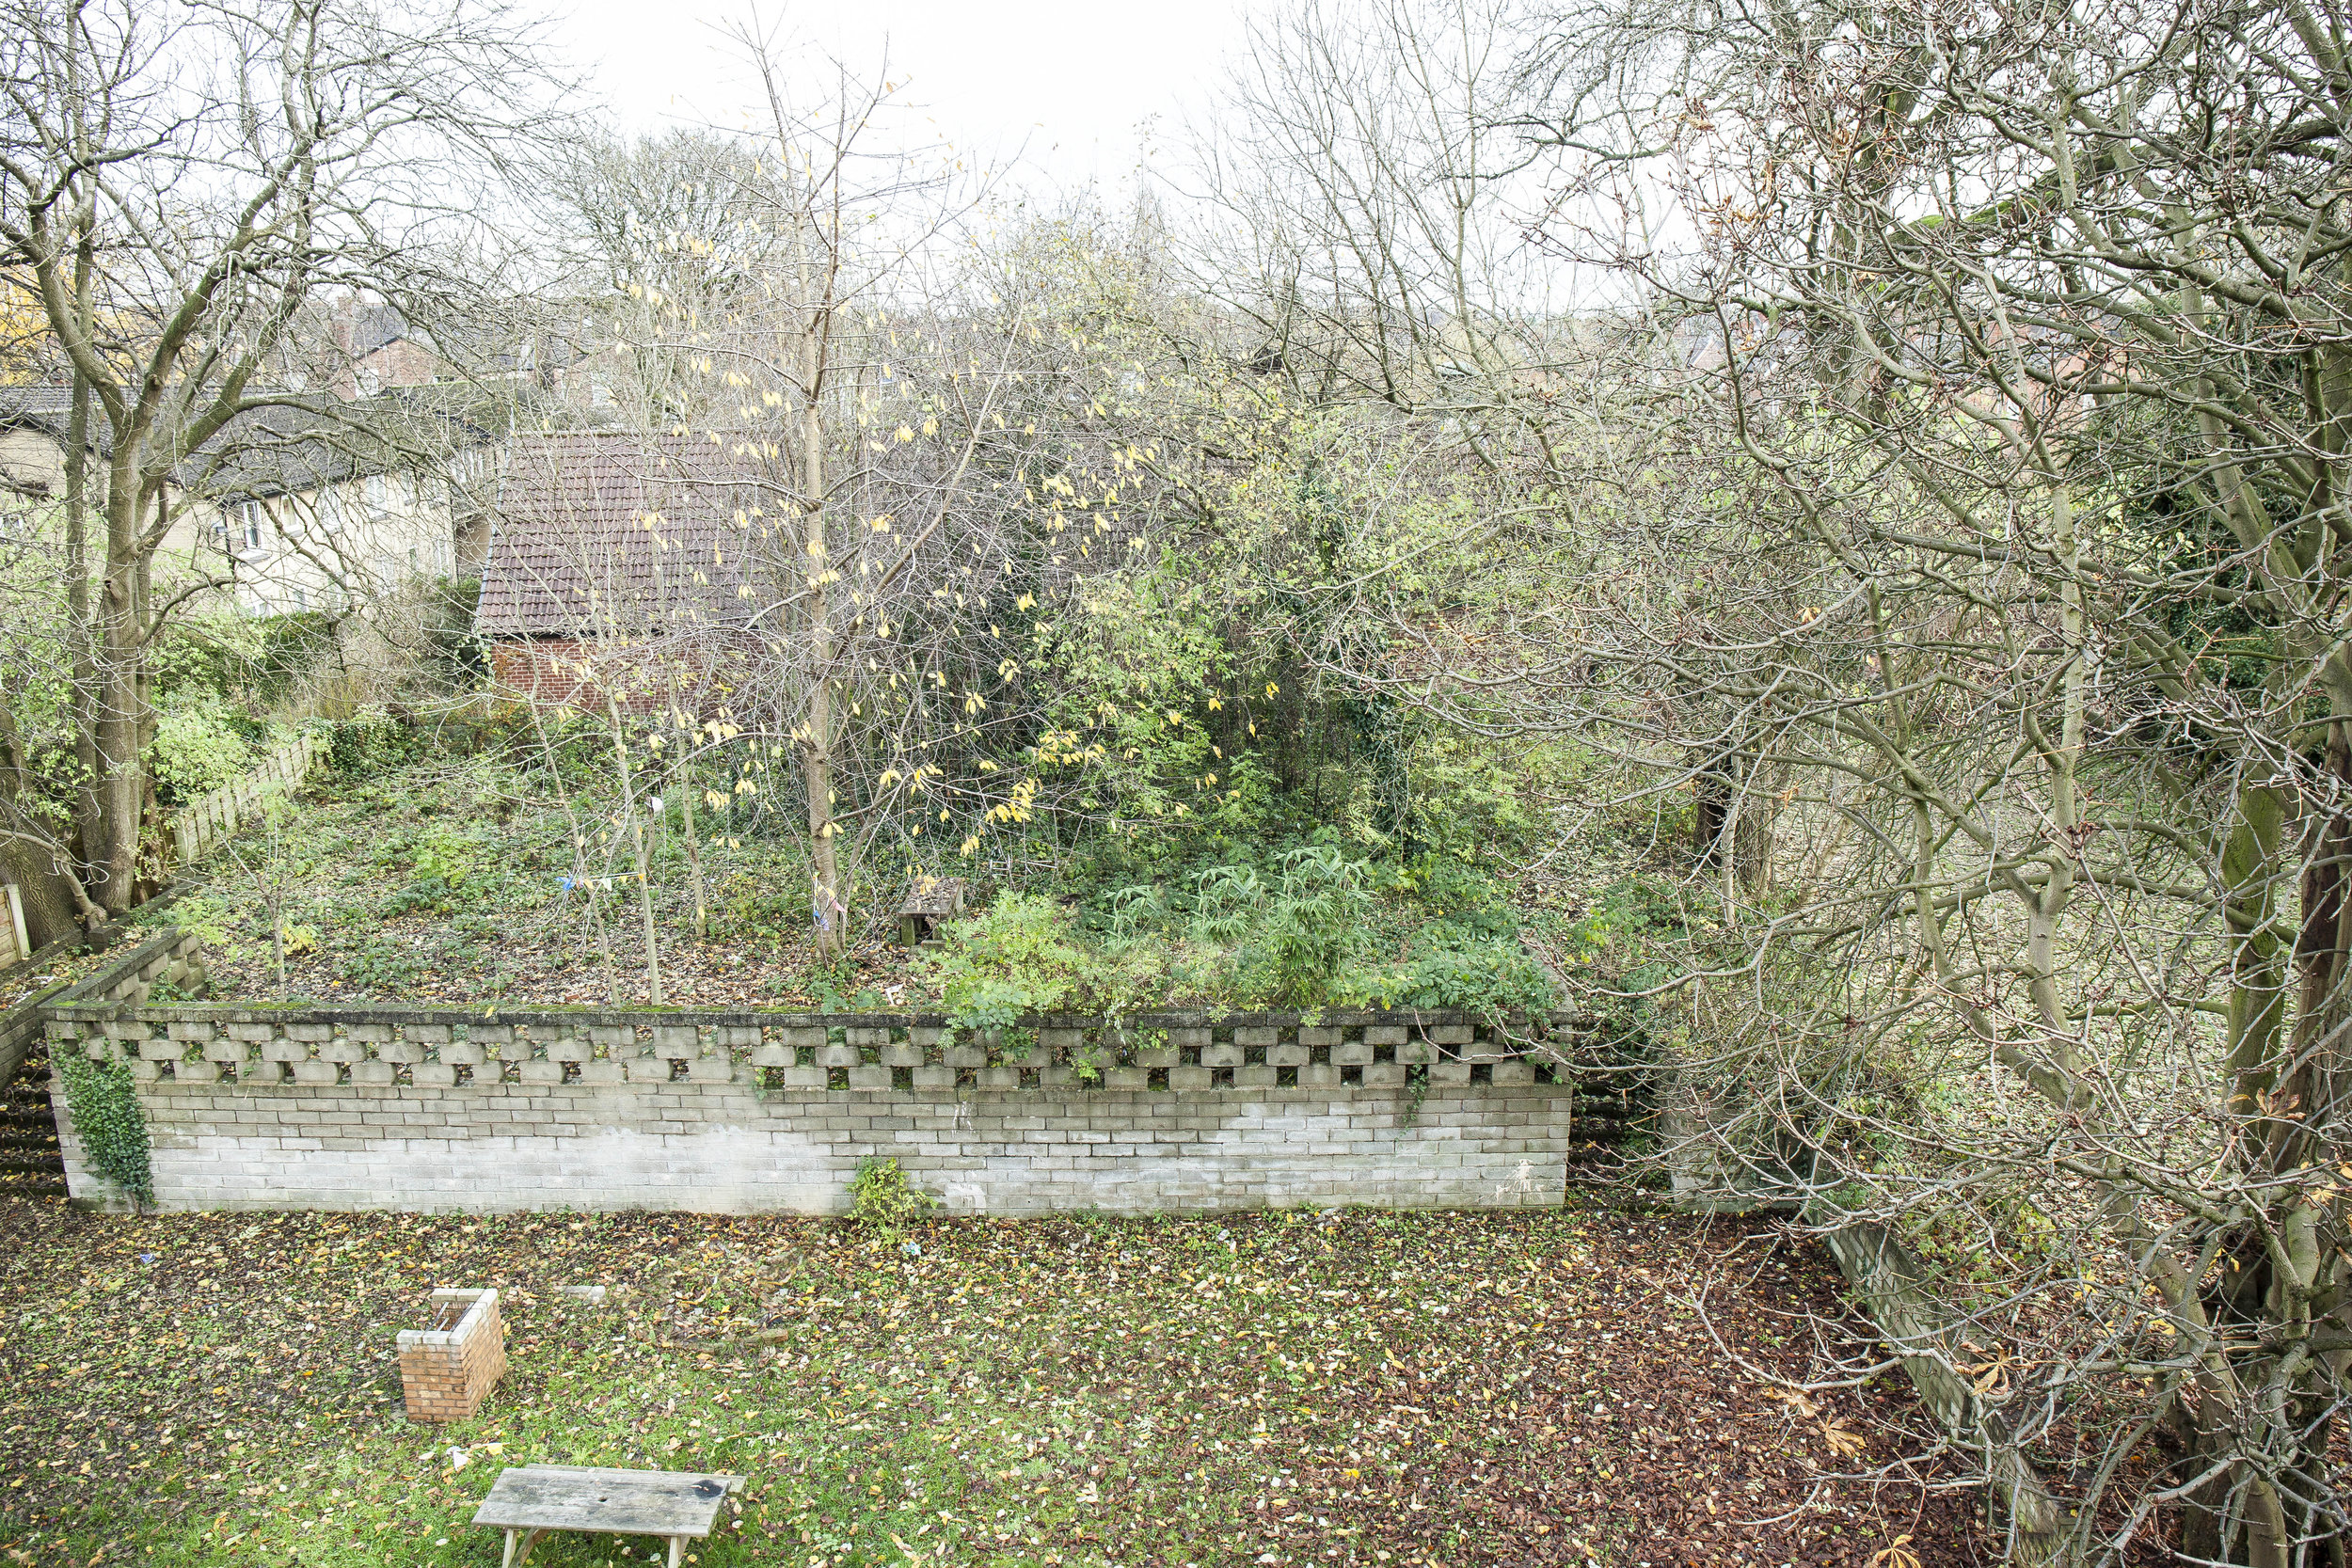 11a Amherst Road Garden